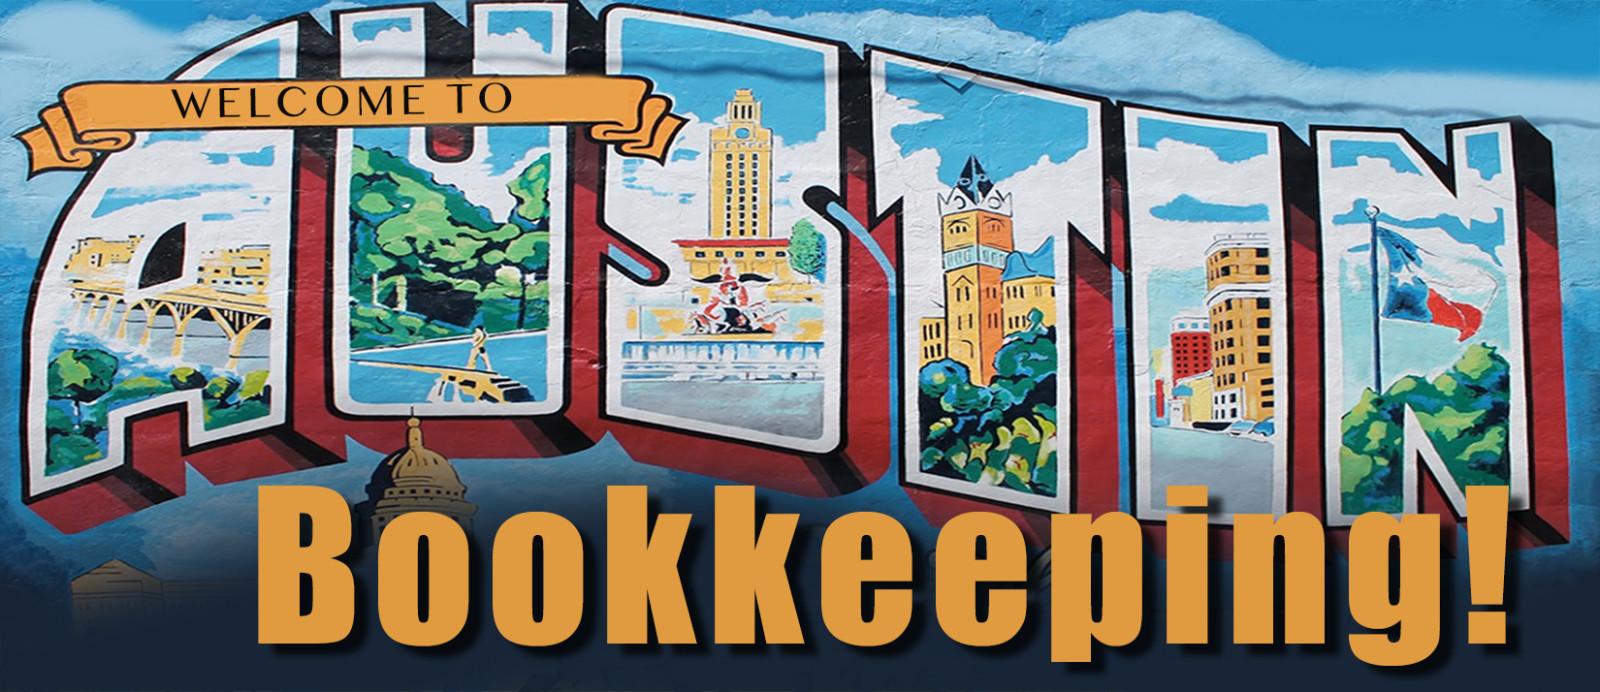 austin bookkeeping new header